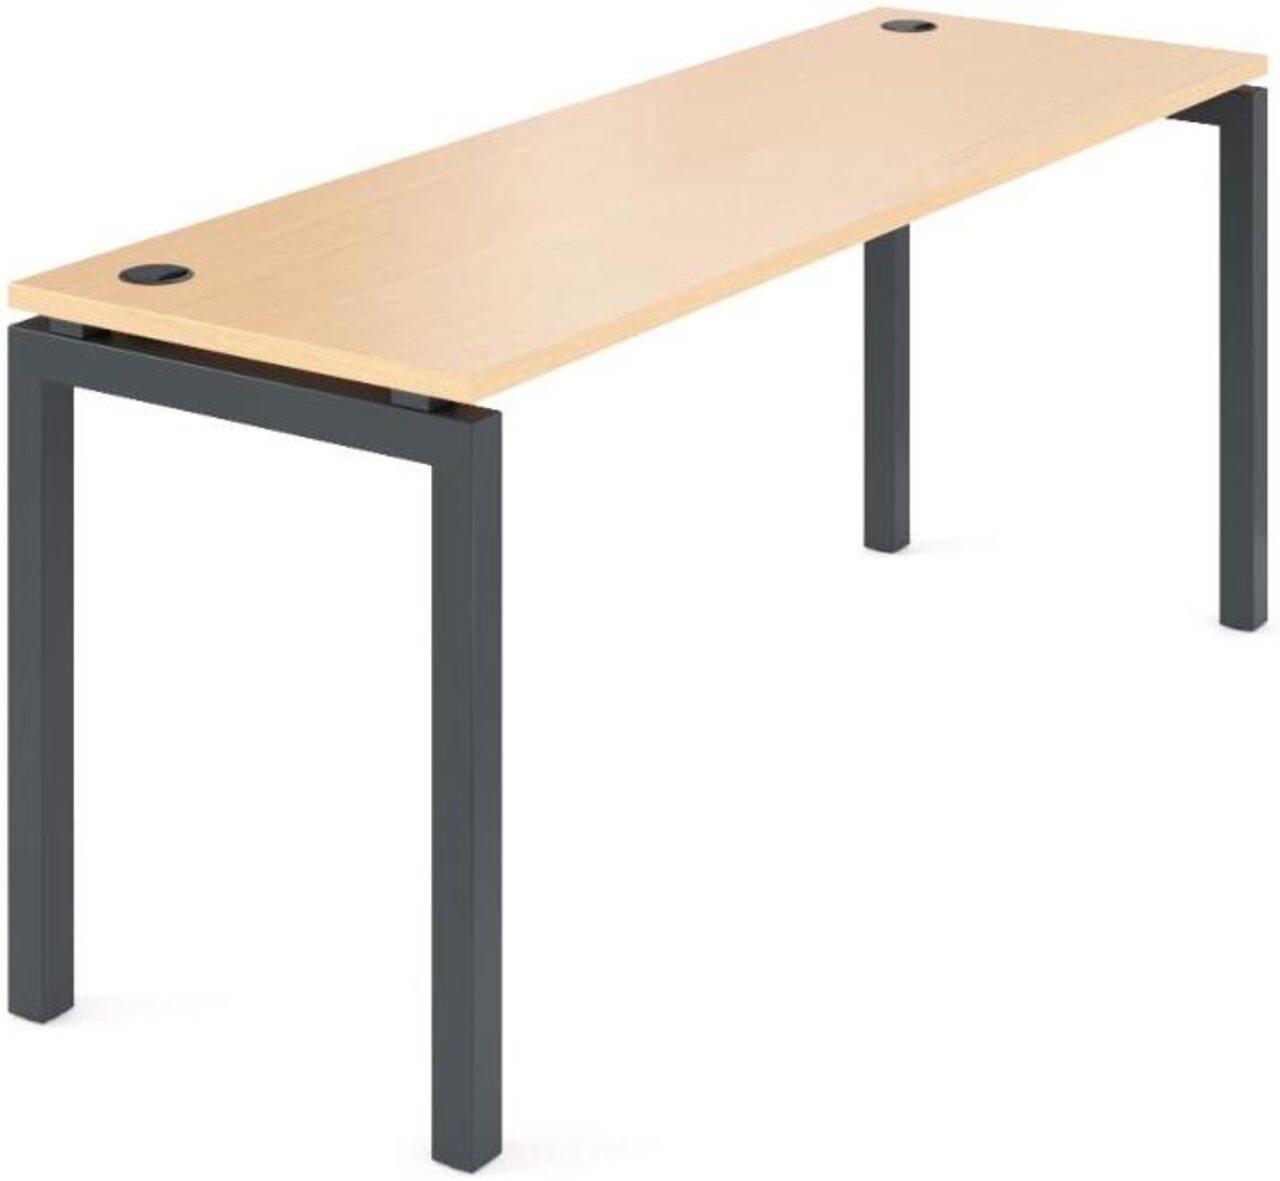 Стол на металлокаркасе  Арго 180x60x76 - фото 7